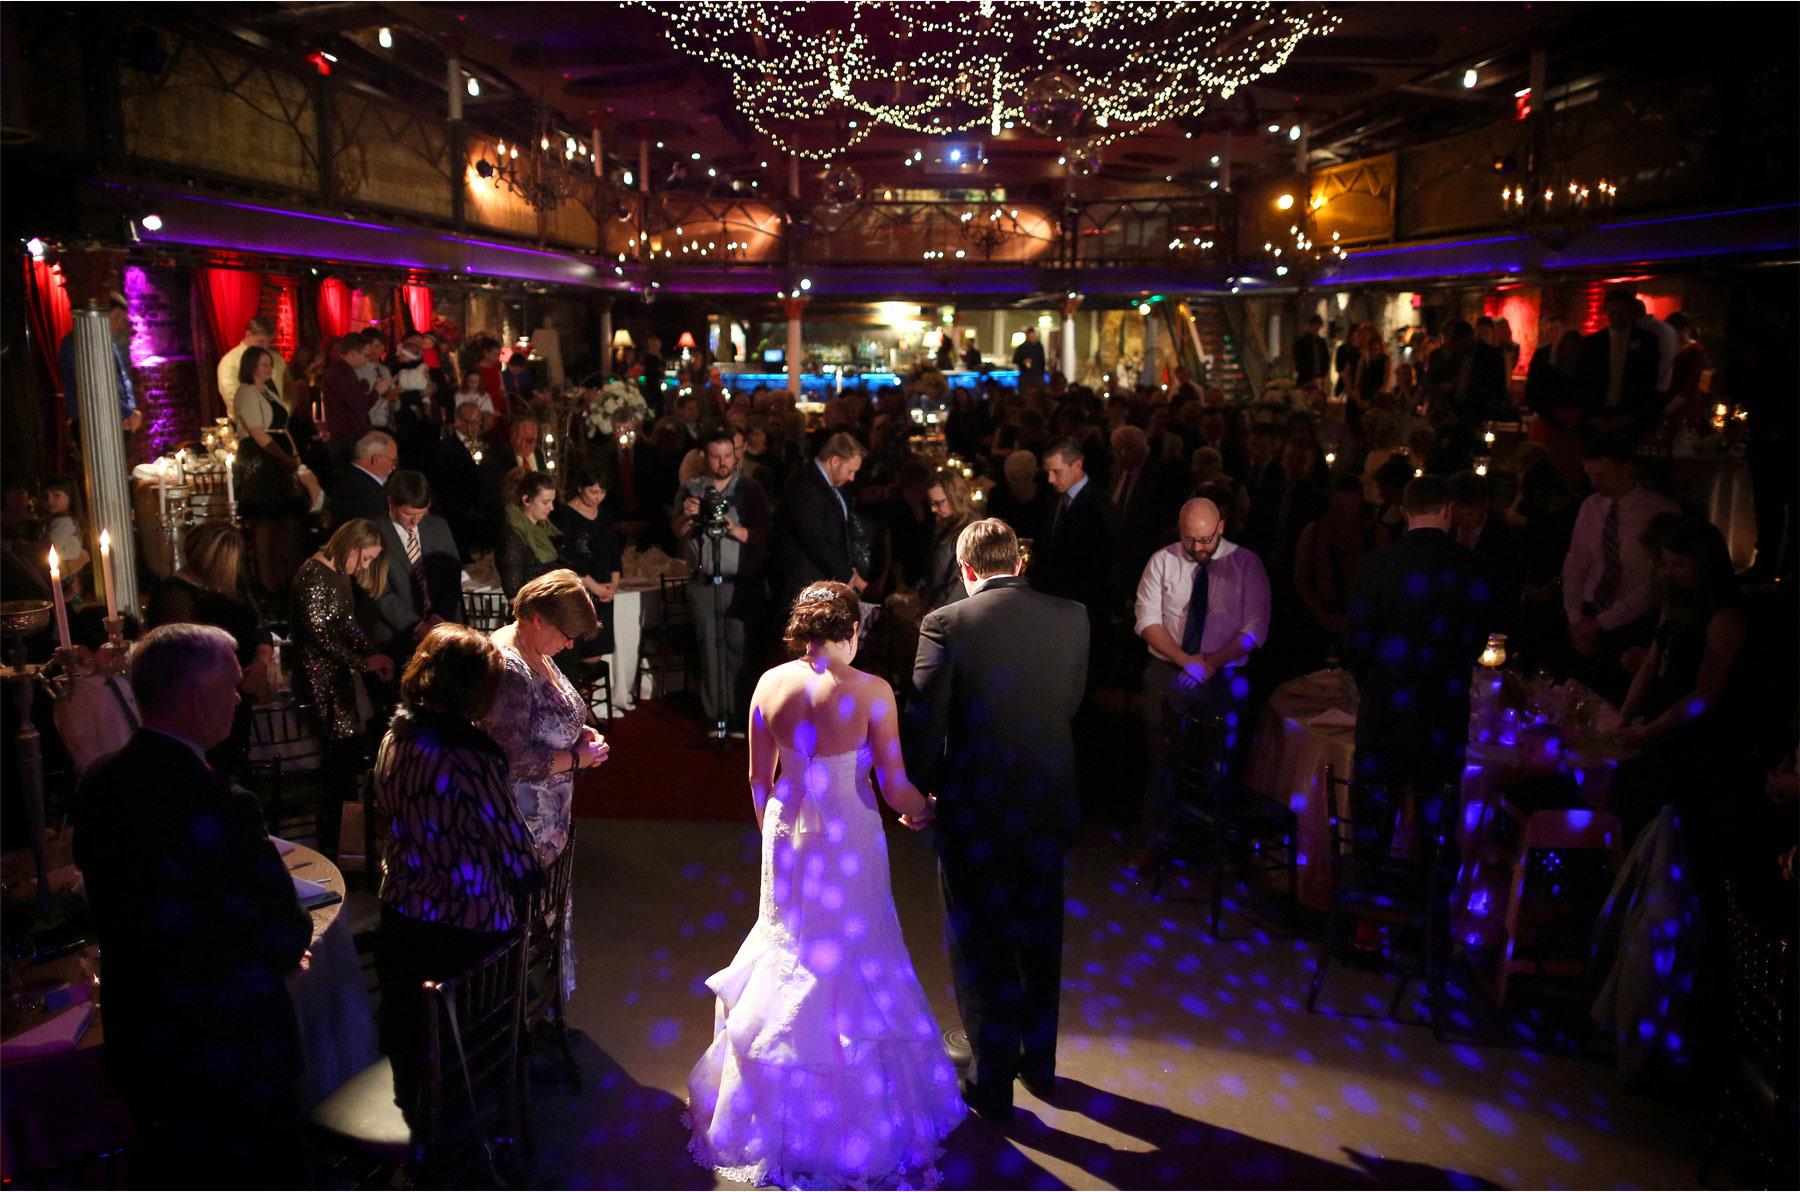 18-Minneapolis-Minnesota-Wedding-Photographer-by-Andrew-Vick-Photography-Winter-Varsity-Theater-Reception-Bride-Groom-Prayer-Guests-Sara-and-Rob.jpg